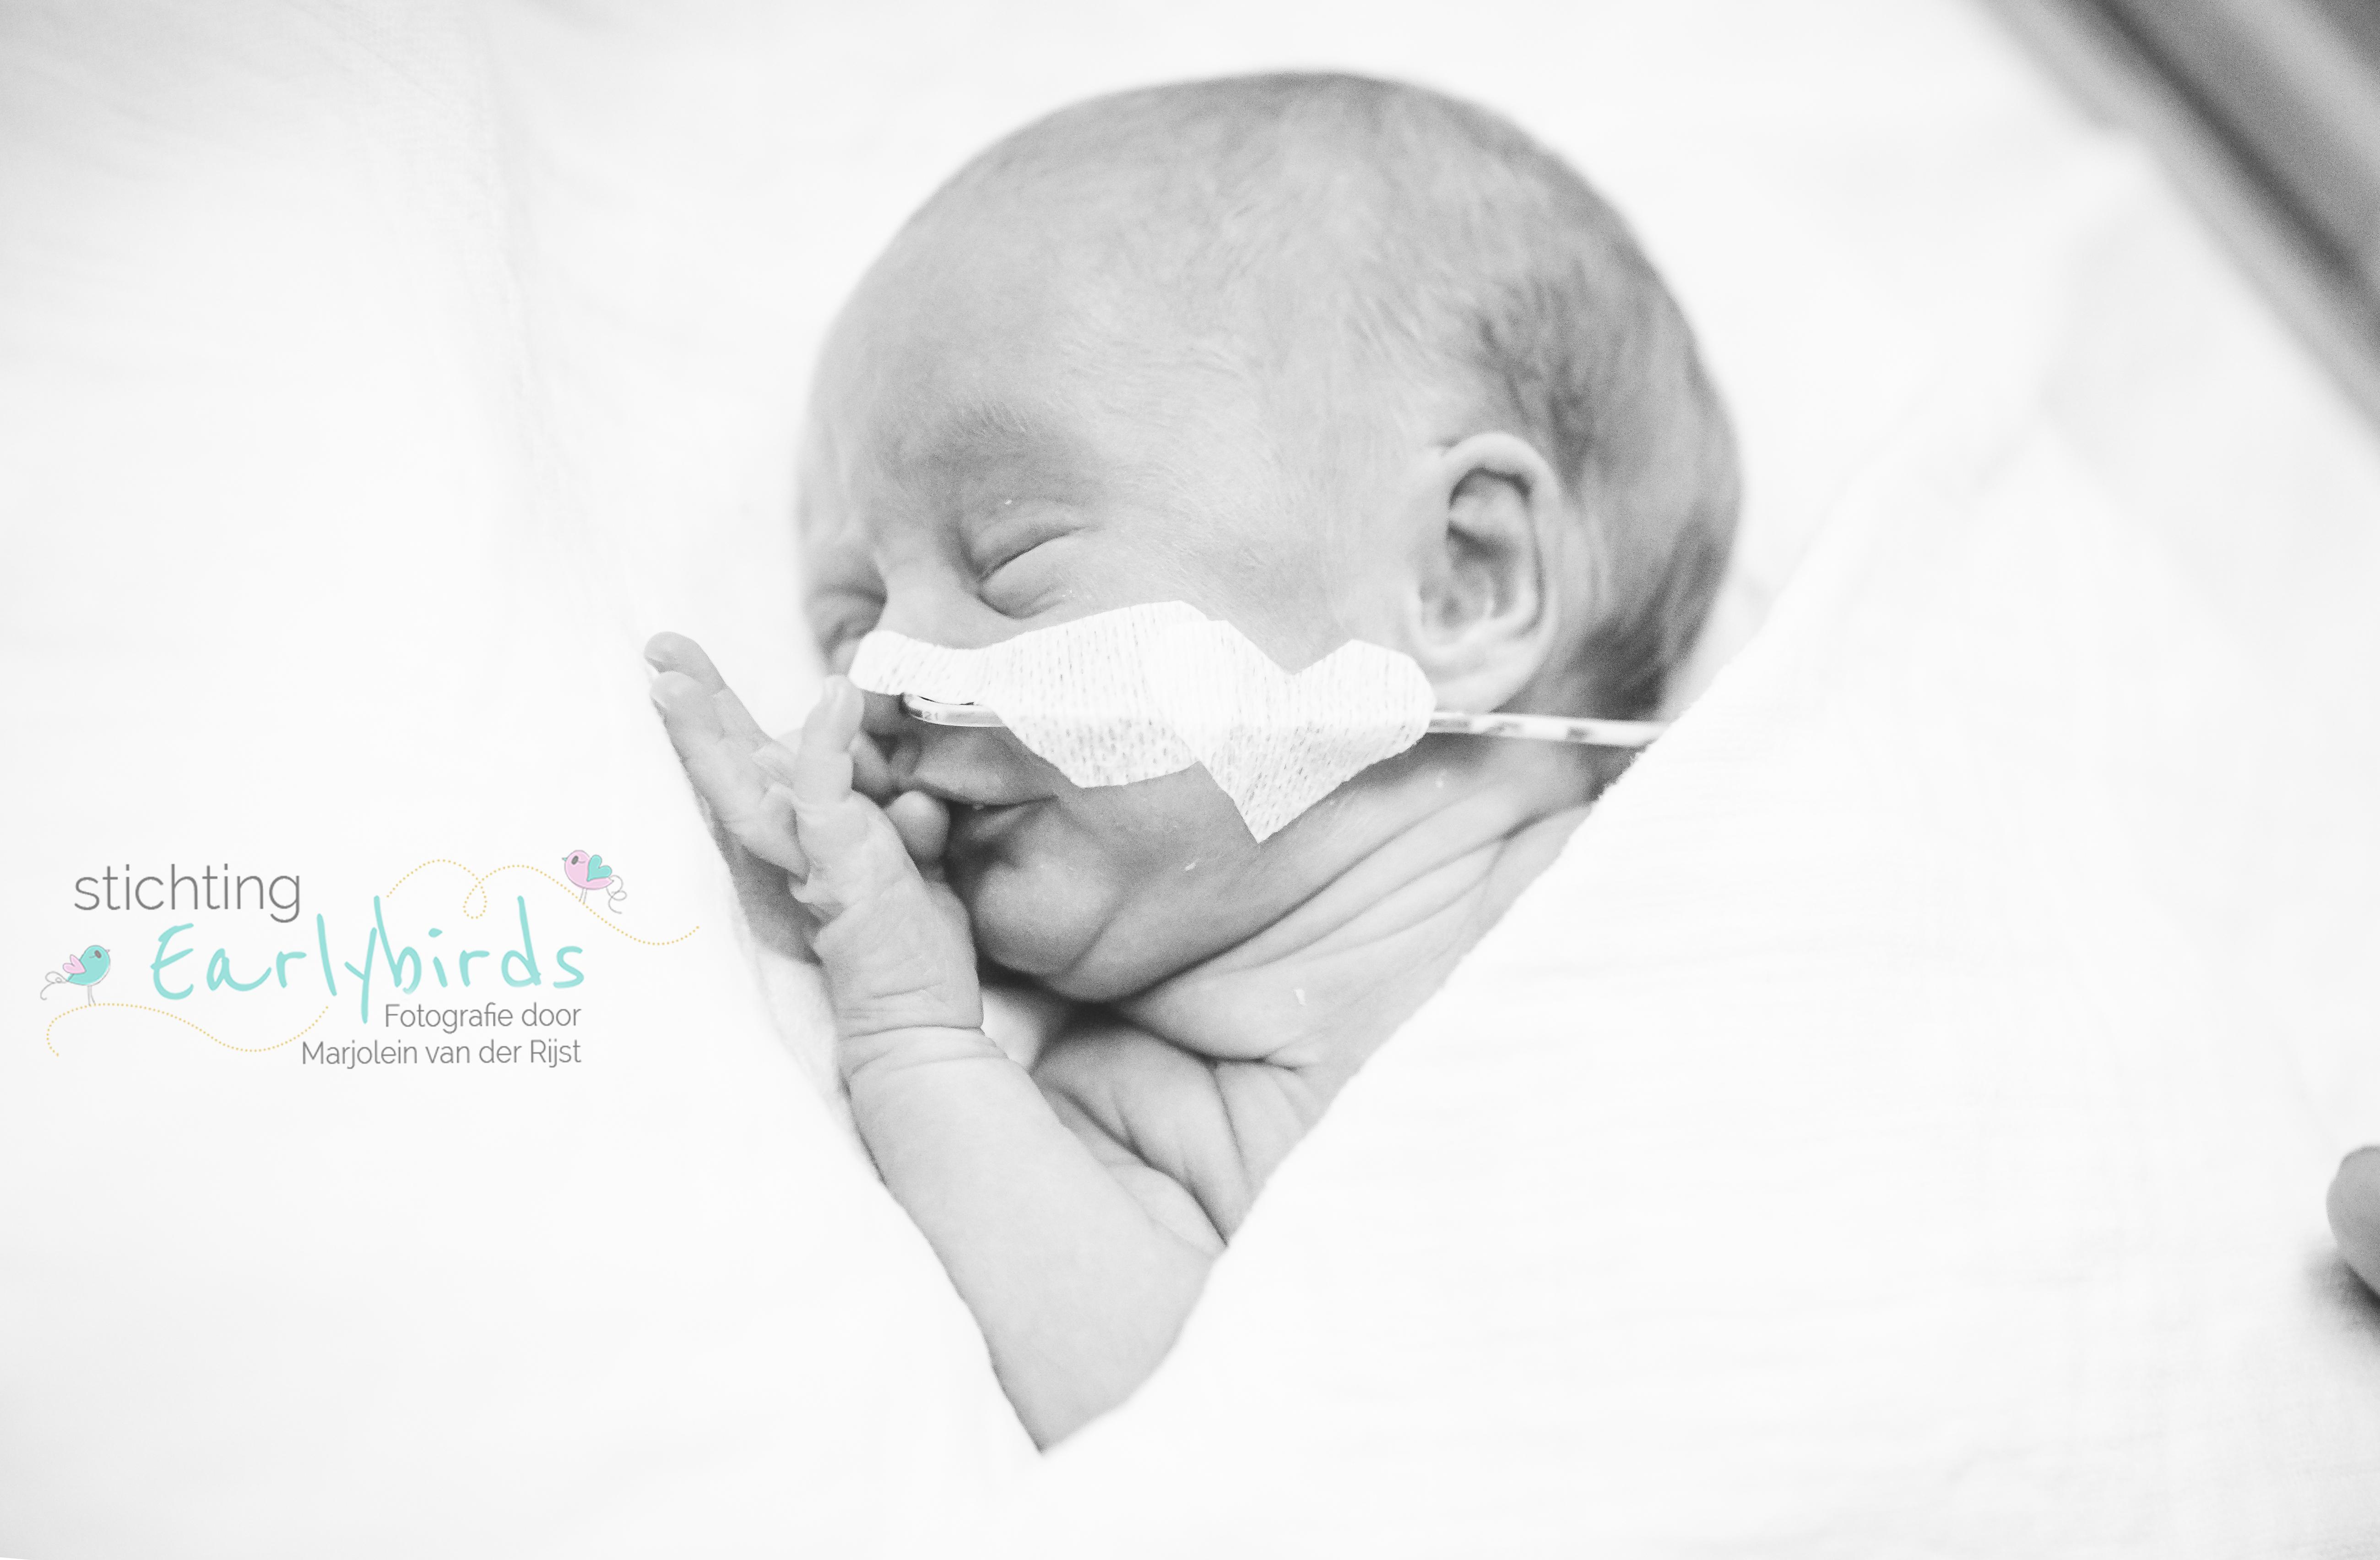 Newborn Fotografie, Lifestyle